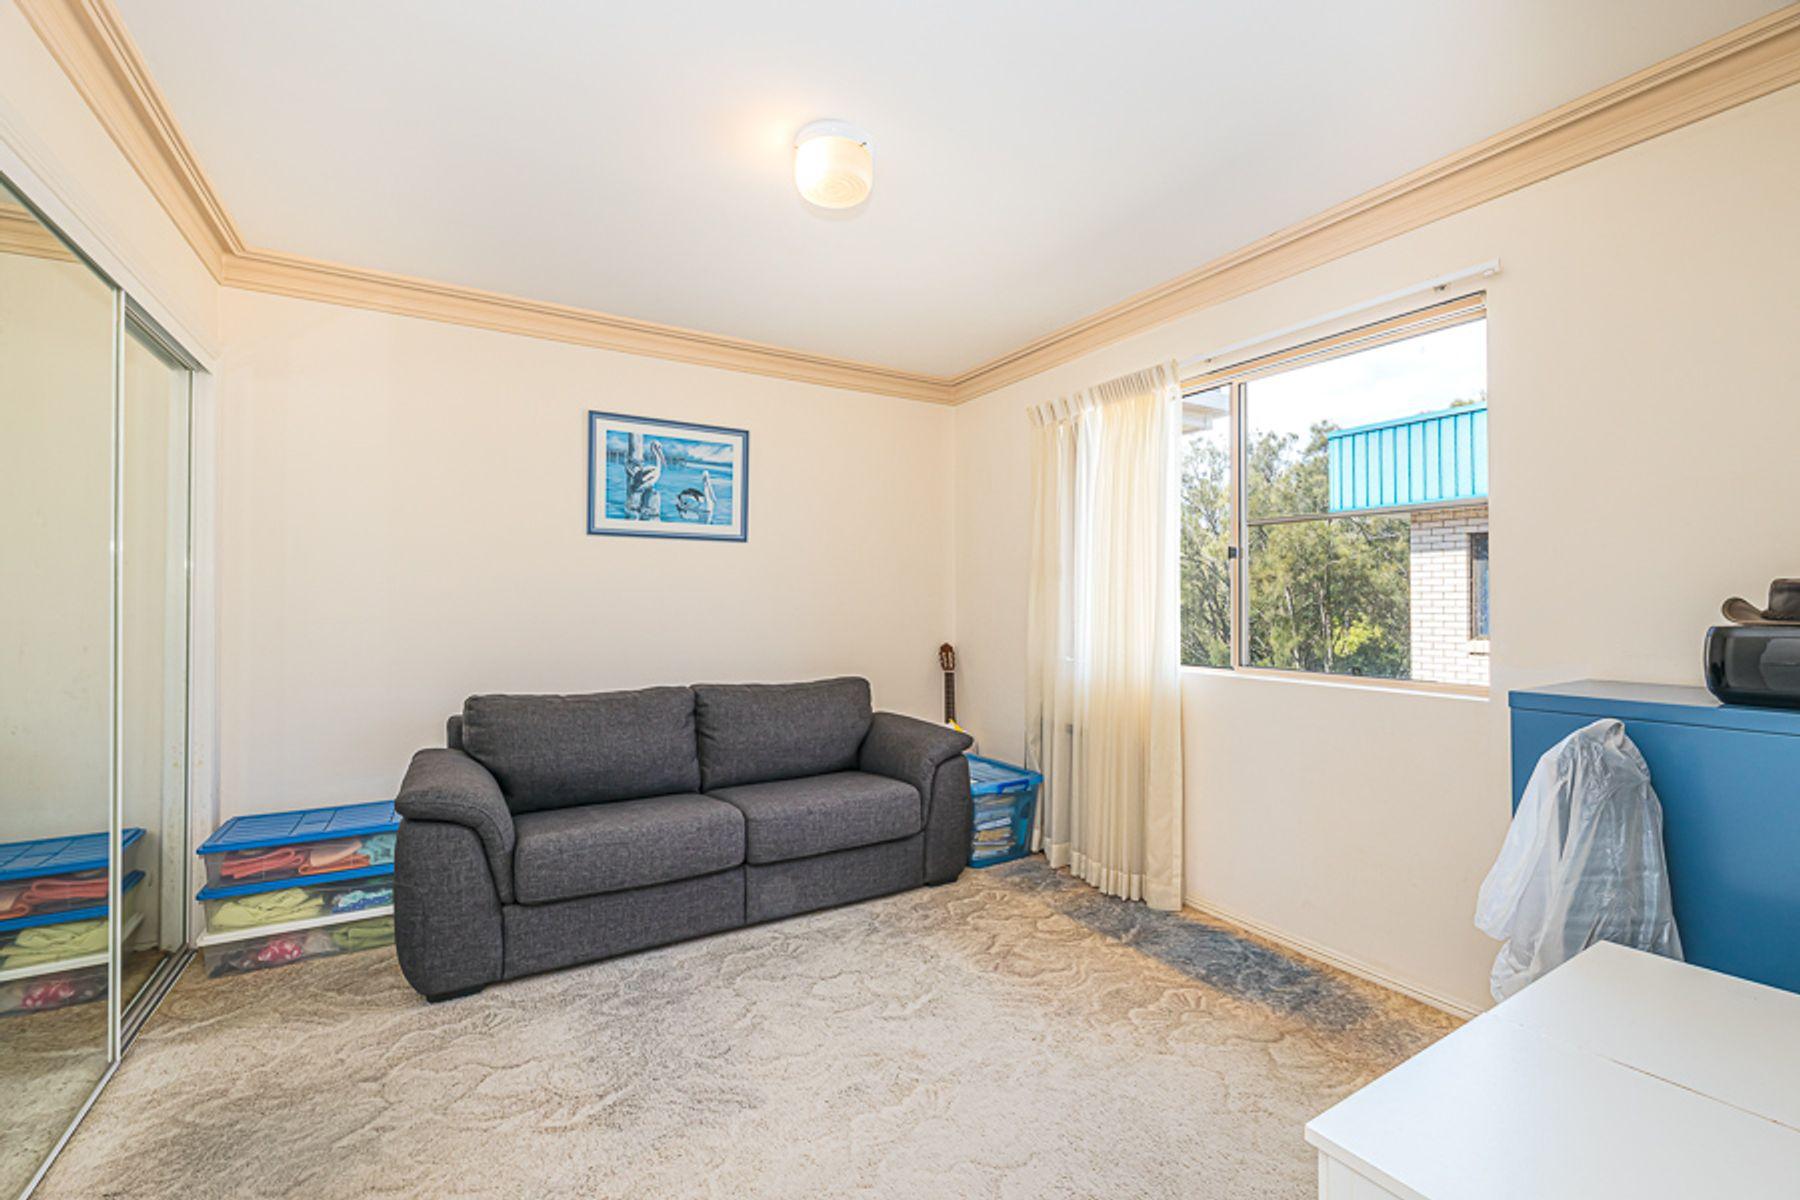 6/7 South Esplanade, Bongaree, QLD 4507